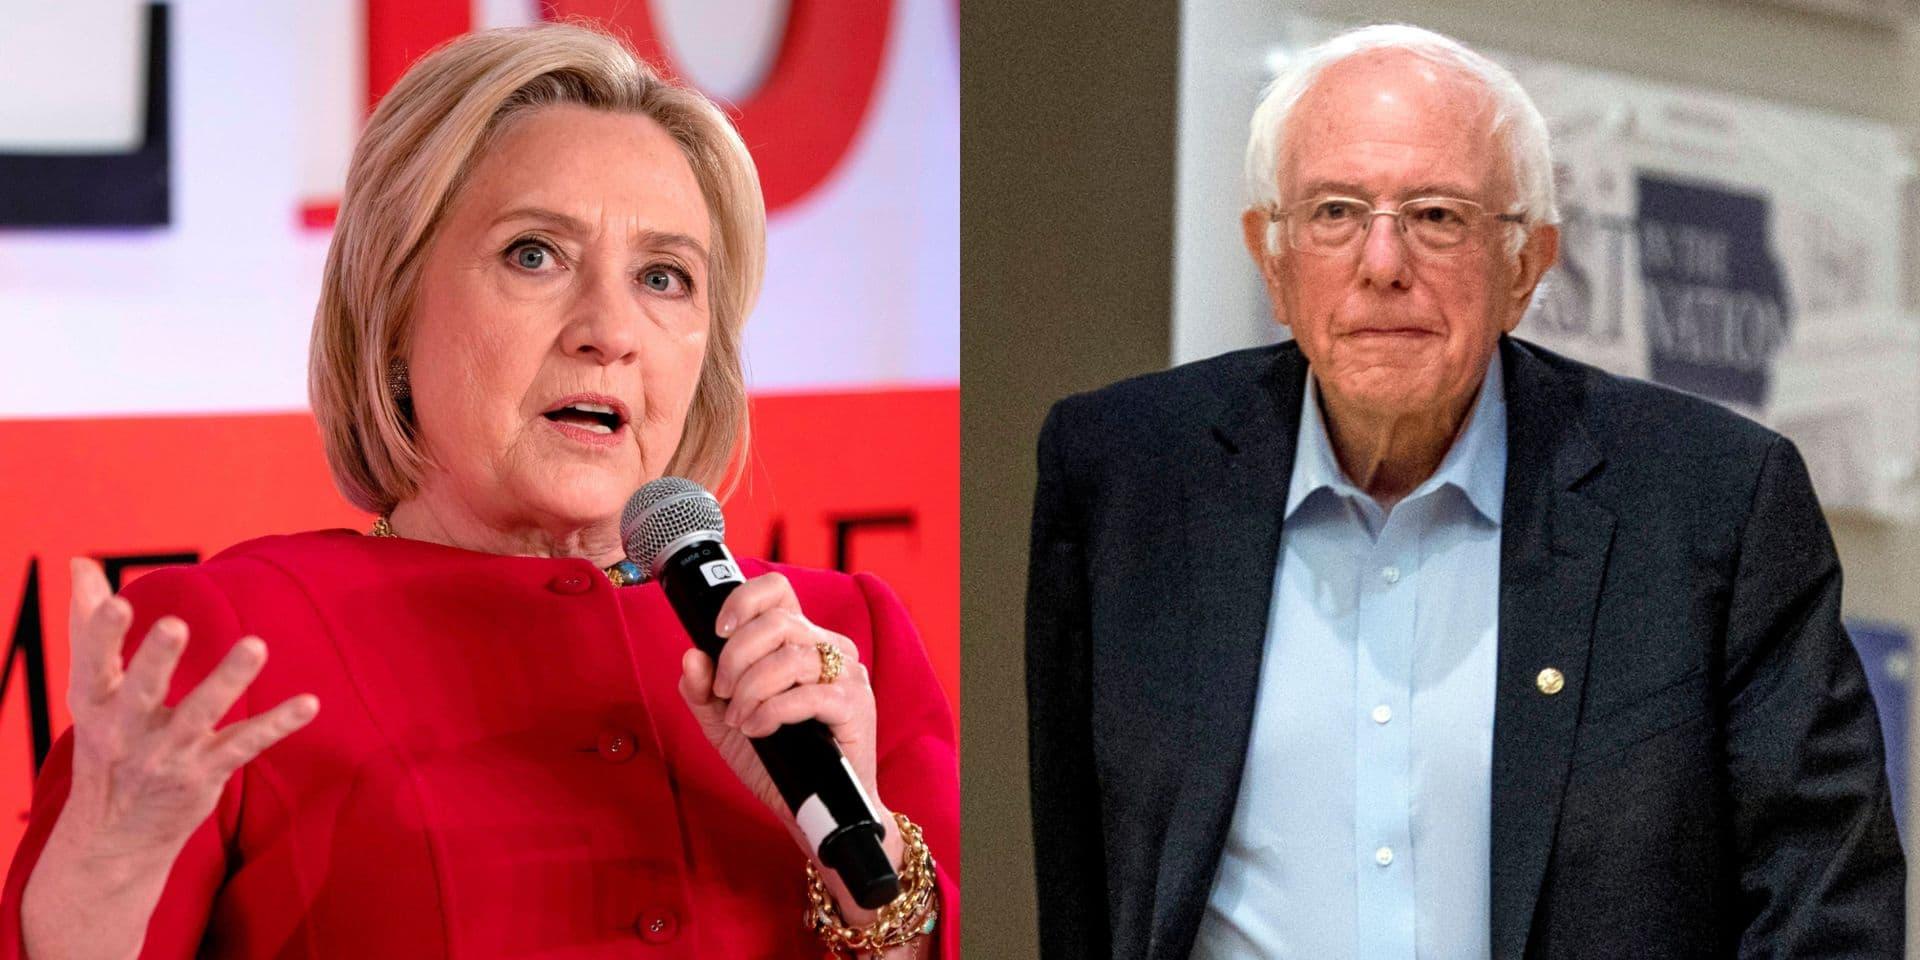 """Personne ne l'aime"": Hillary Clinton s'attaque à son ancien rival Bernie Sanders"